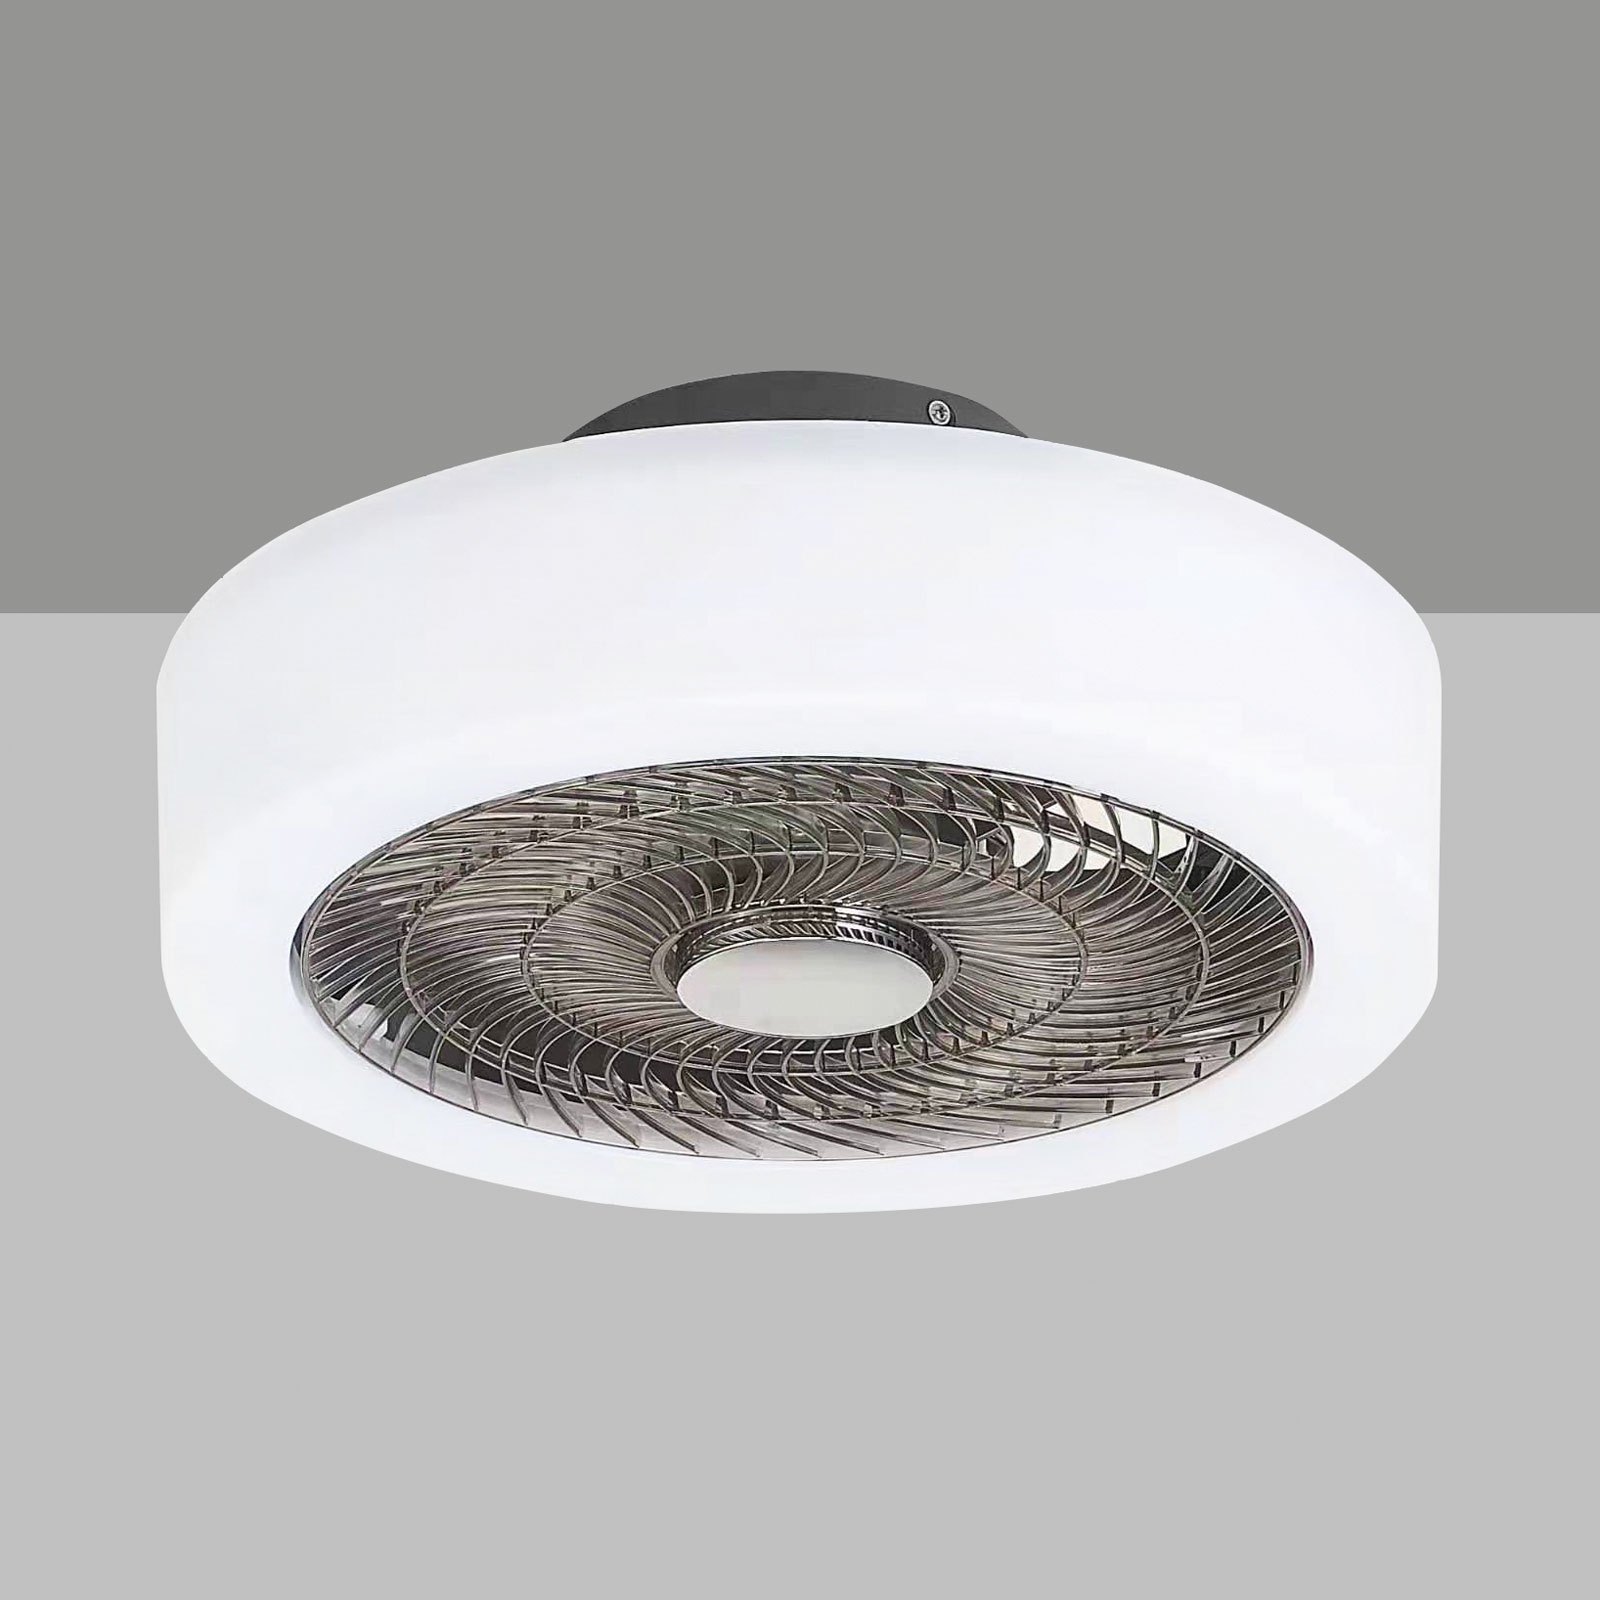 Levante LED-loftventilator med lys, der kan dæmpes